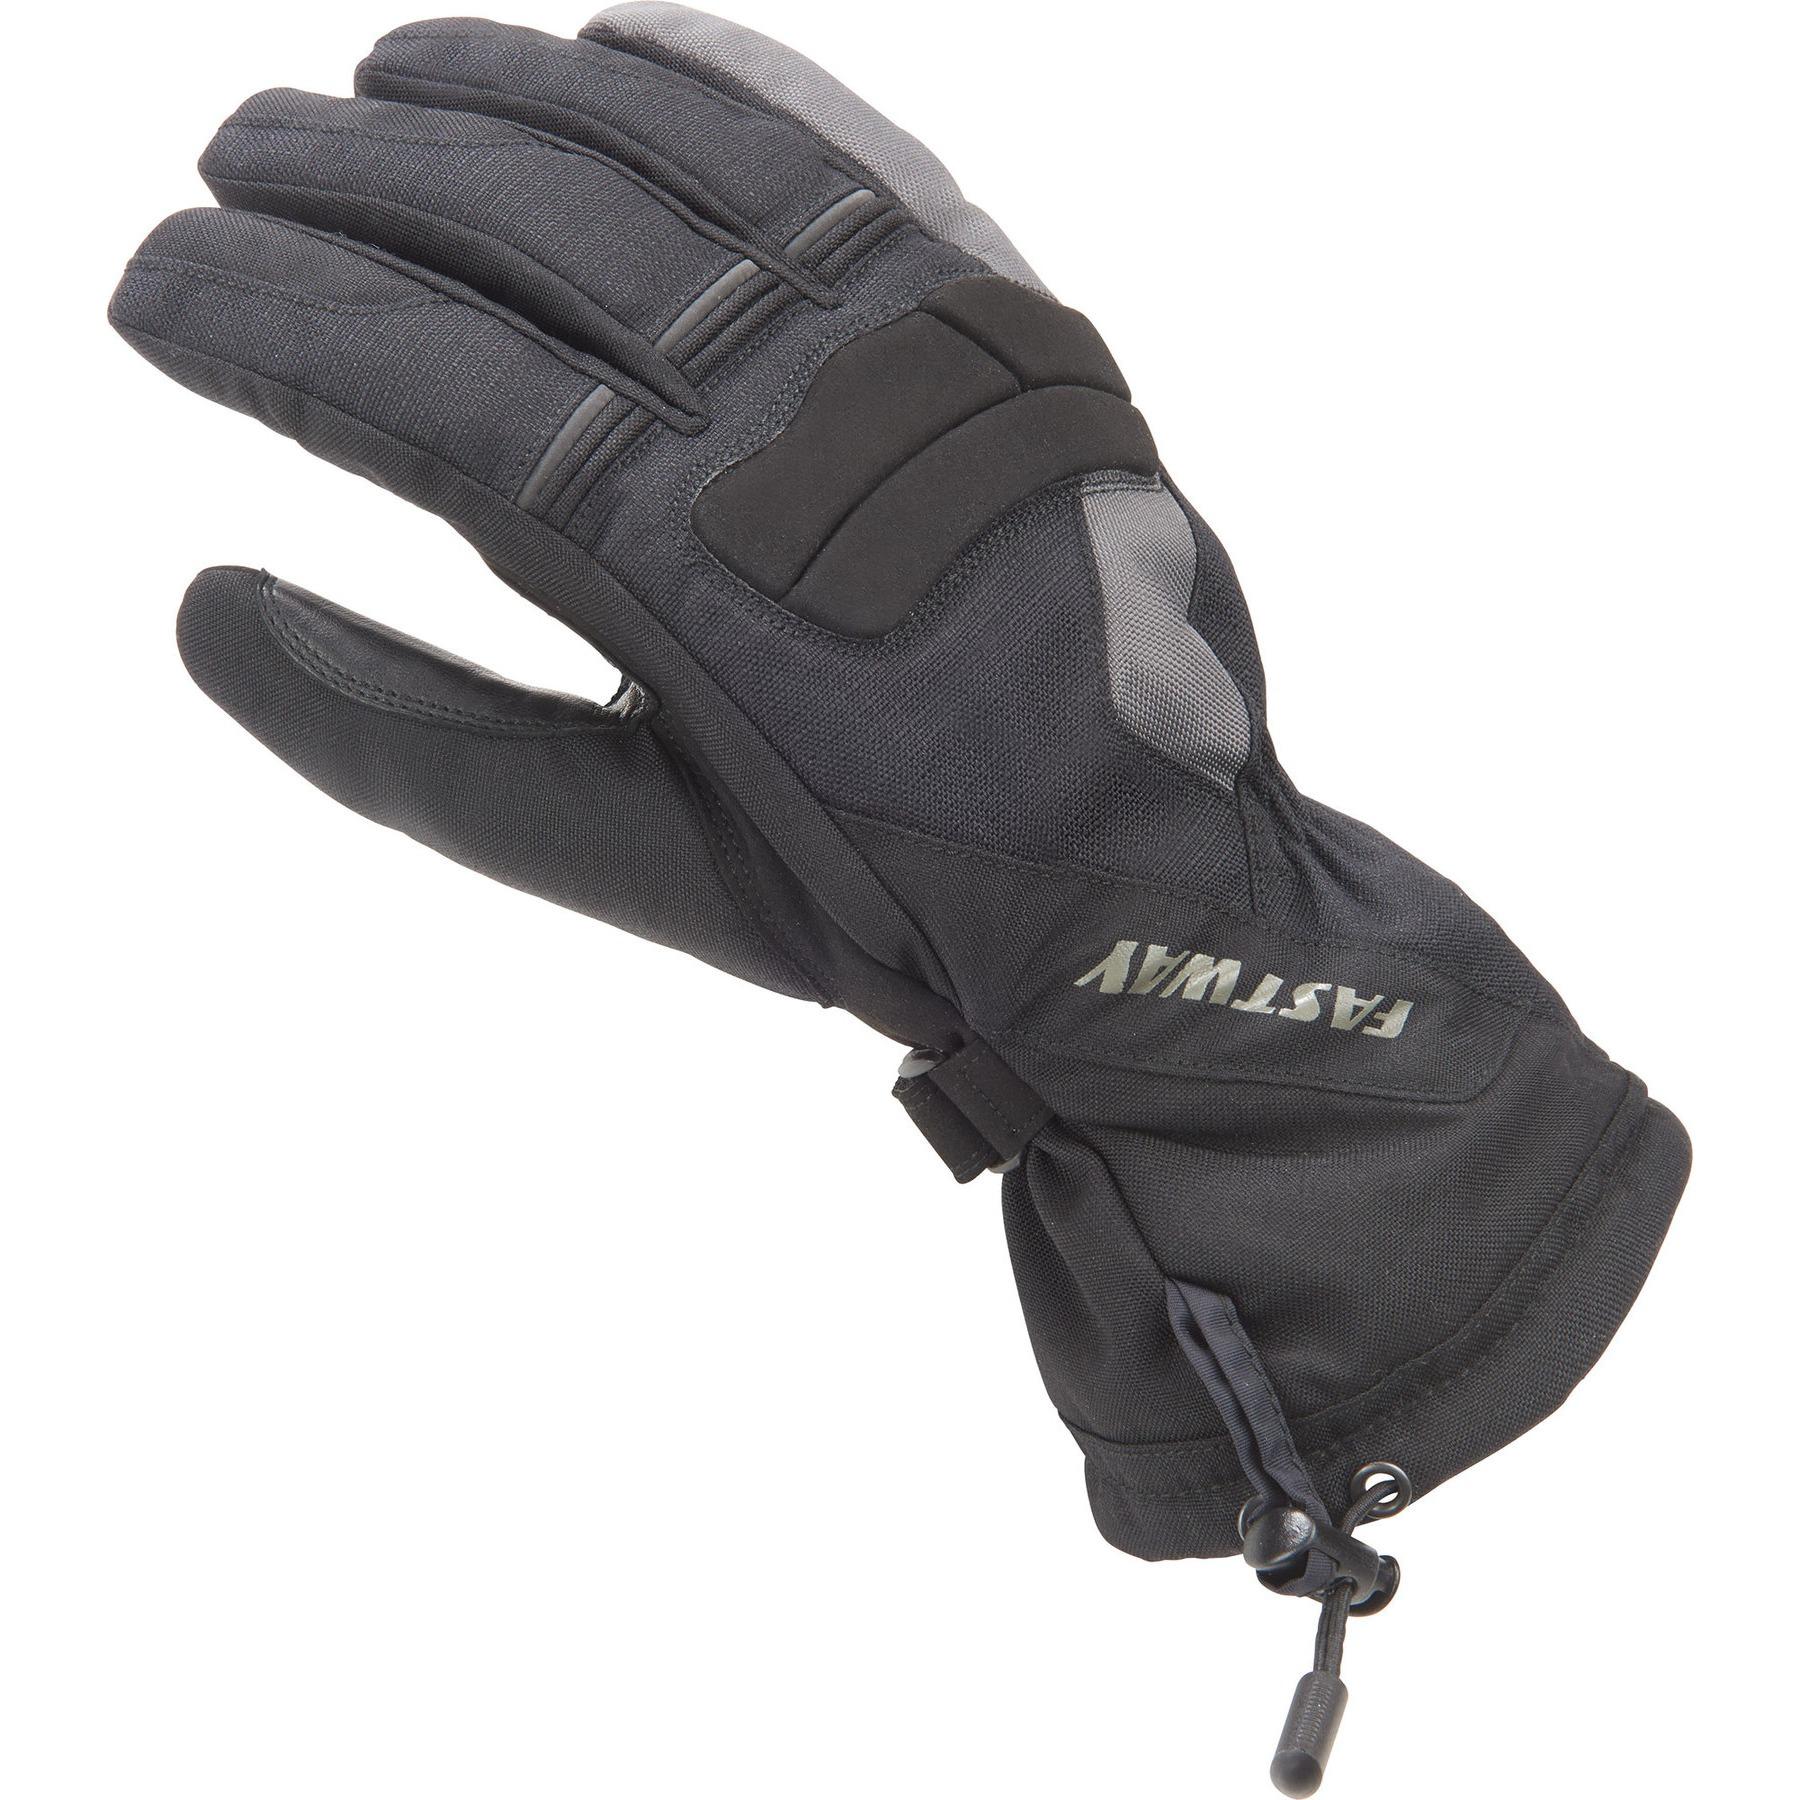 Winter Cycling Handlebar Mitts Bike Motorcycle Gloves Waterproof pu Leather New